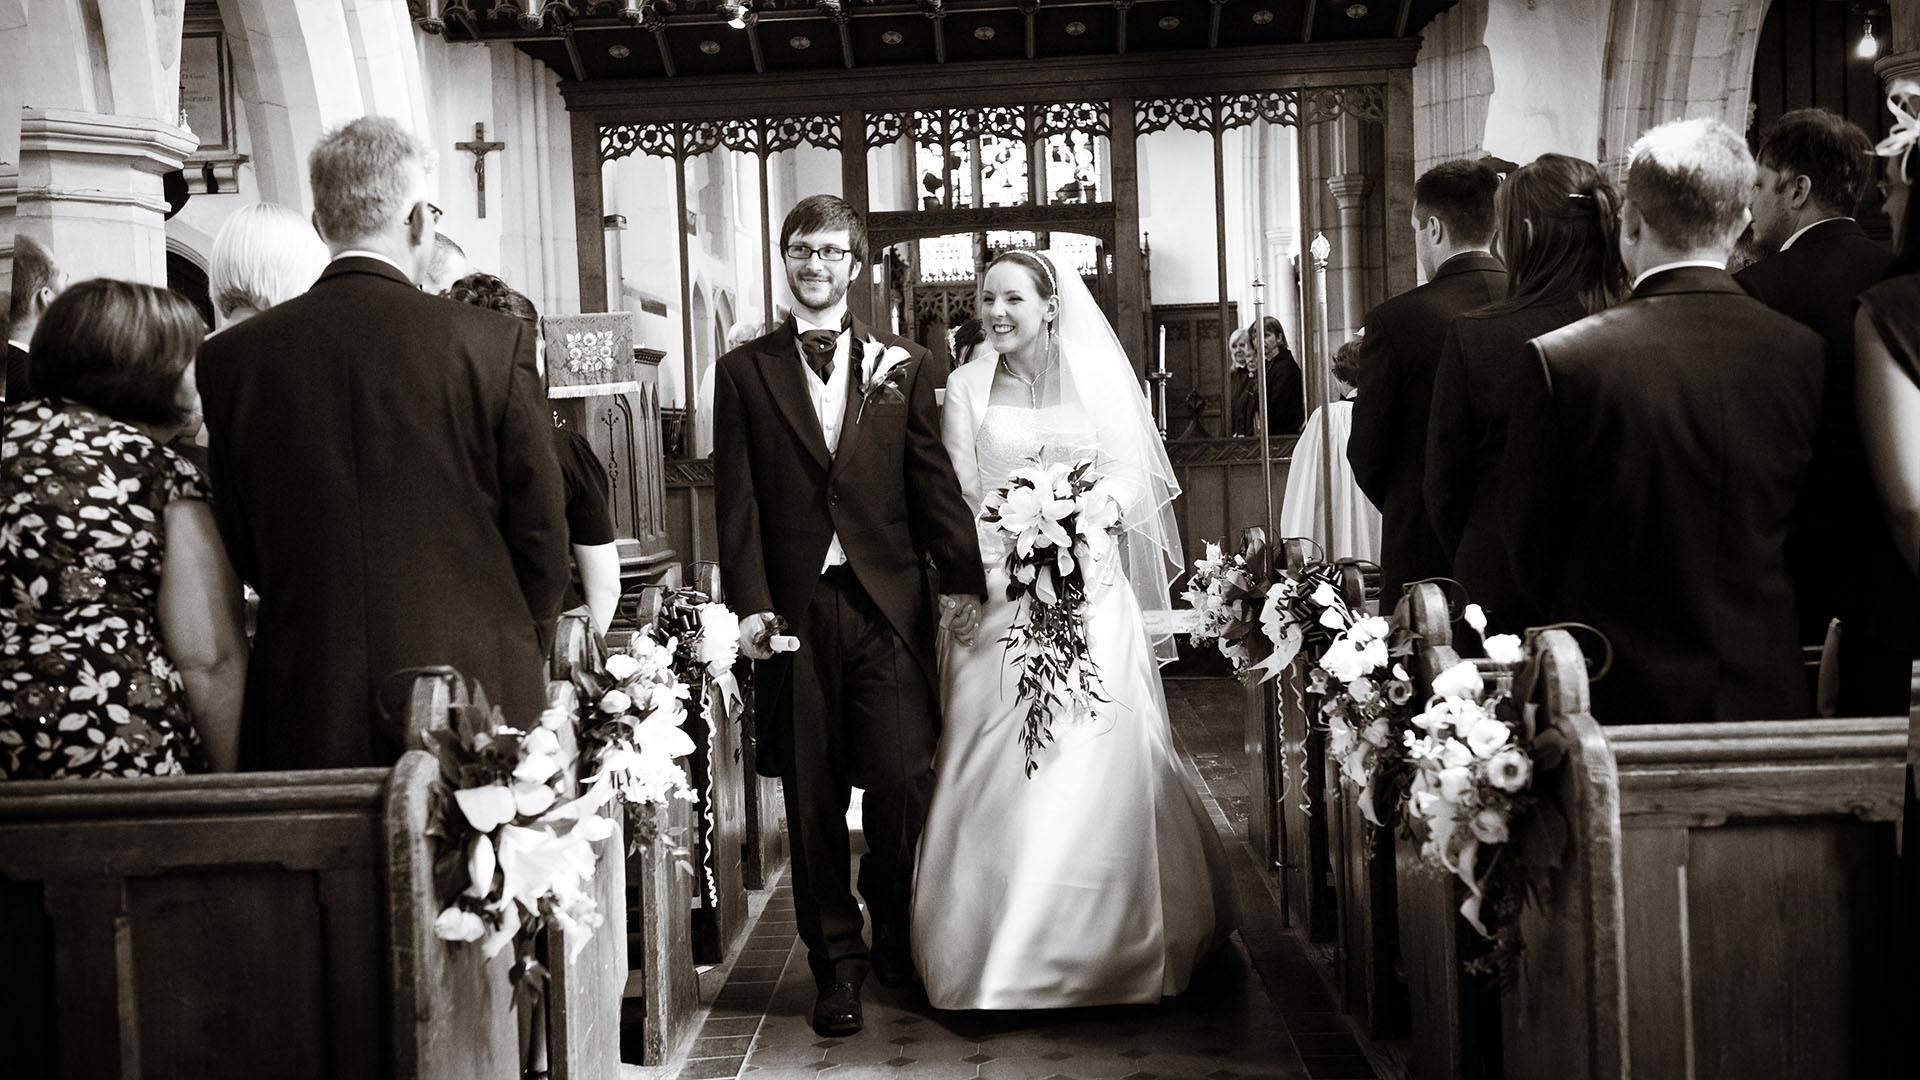 Ben and bernice wedding